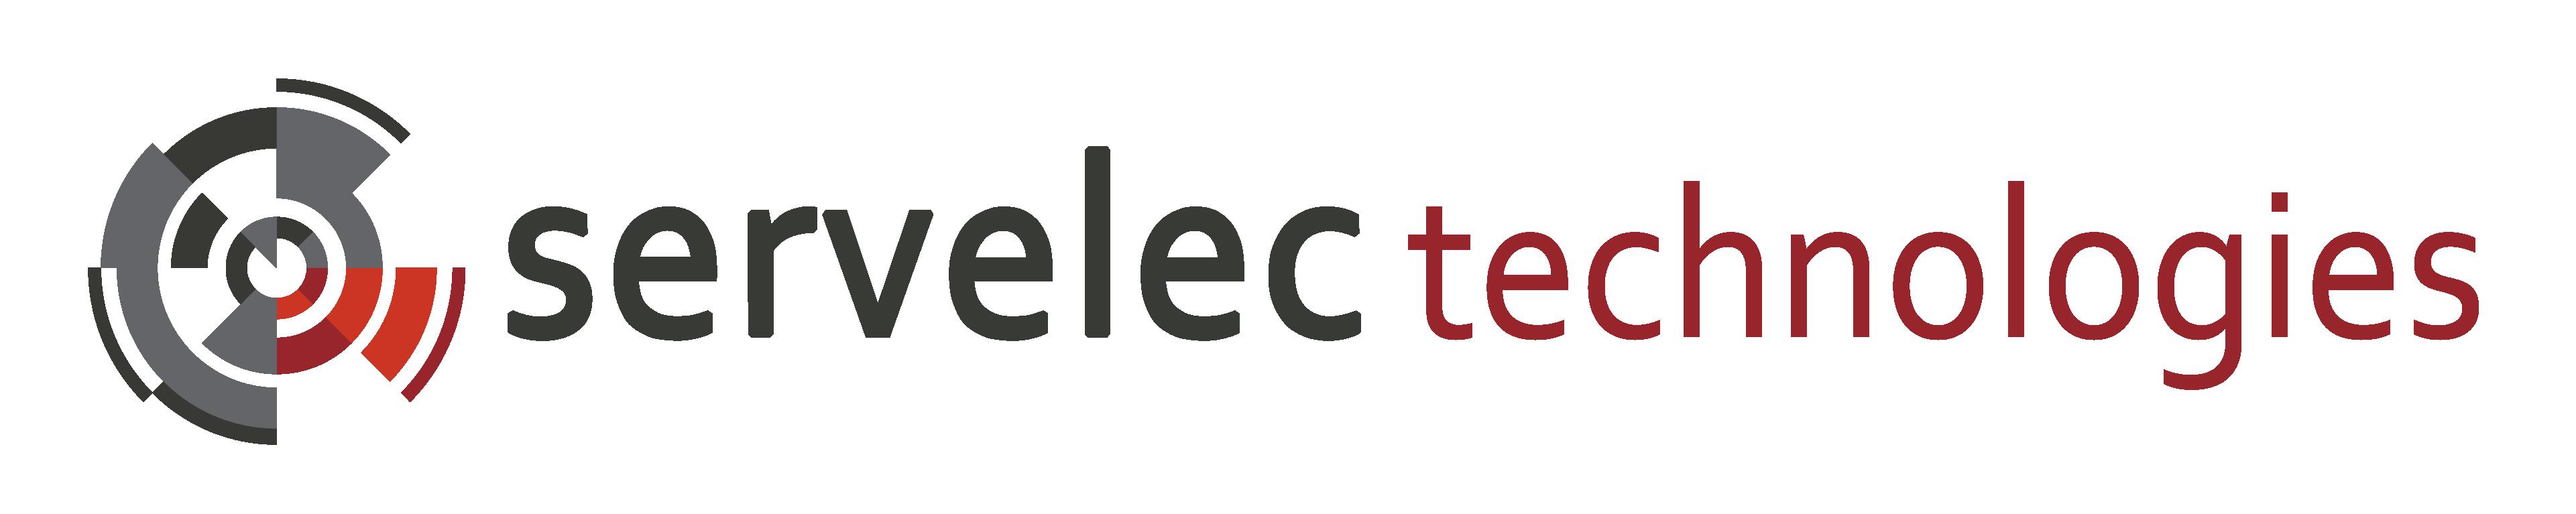 https://campaign-image.com/zohocampaigns/513263000001007524_zc_v9_servelec_primary_logo_technologies.png